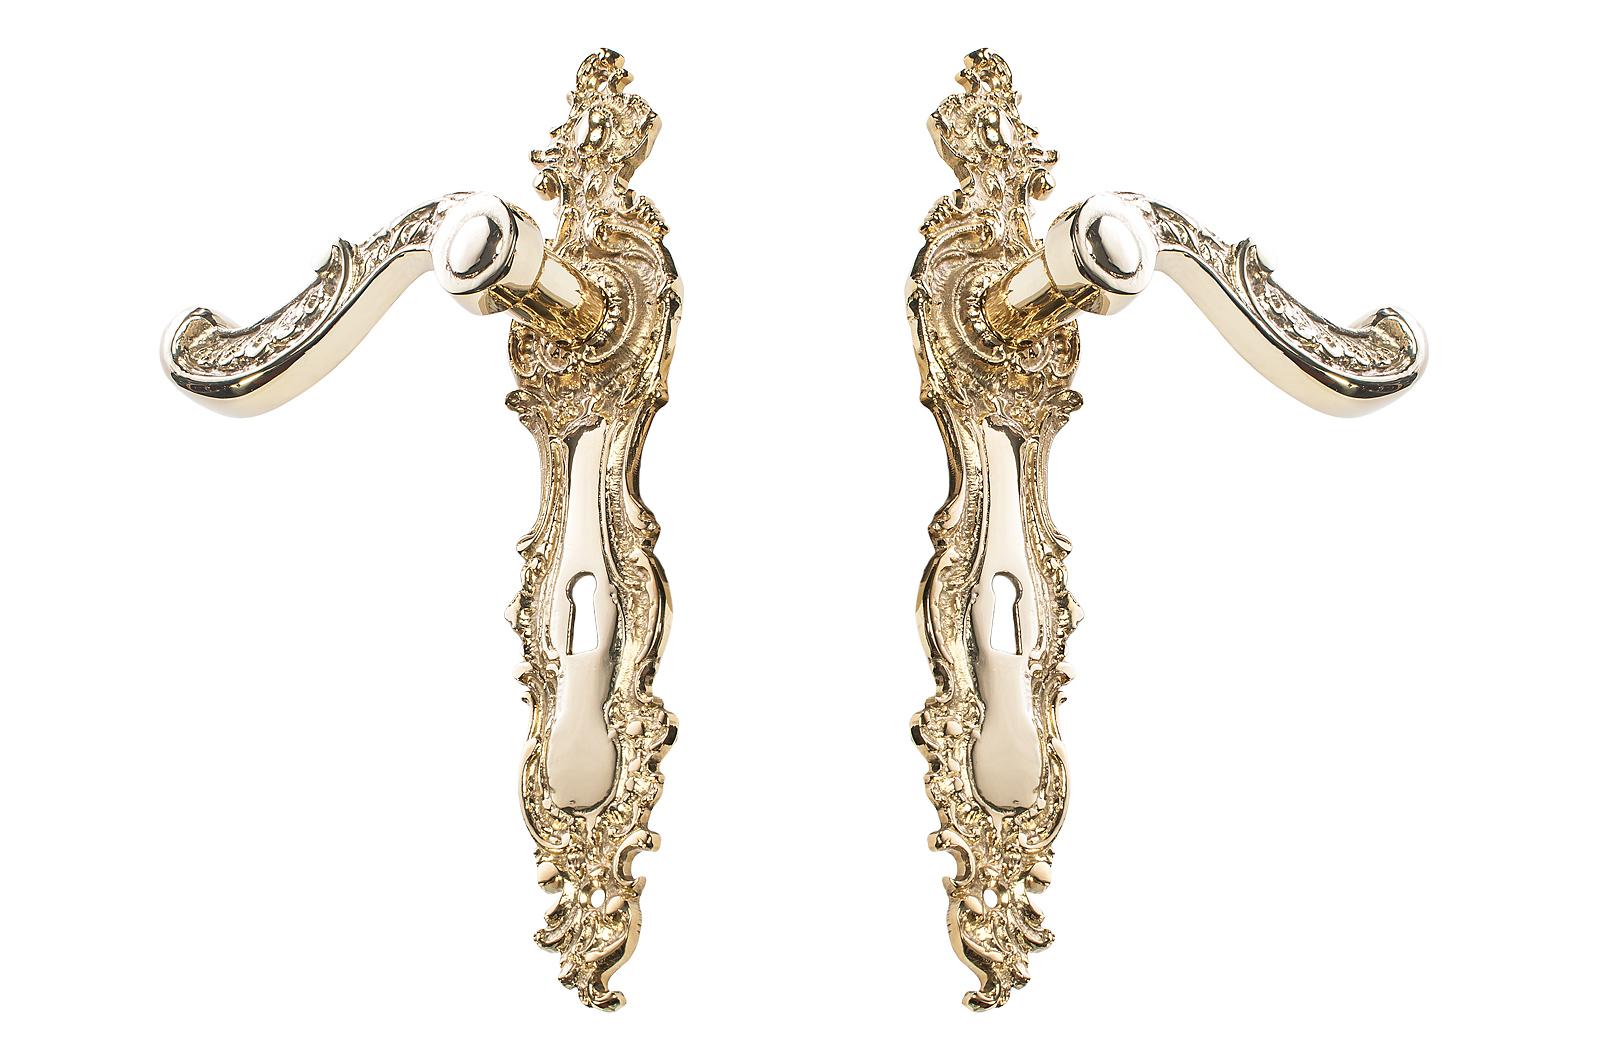 Retro mosadzná kľučka na dvere s mosadzným kľúčom 72